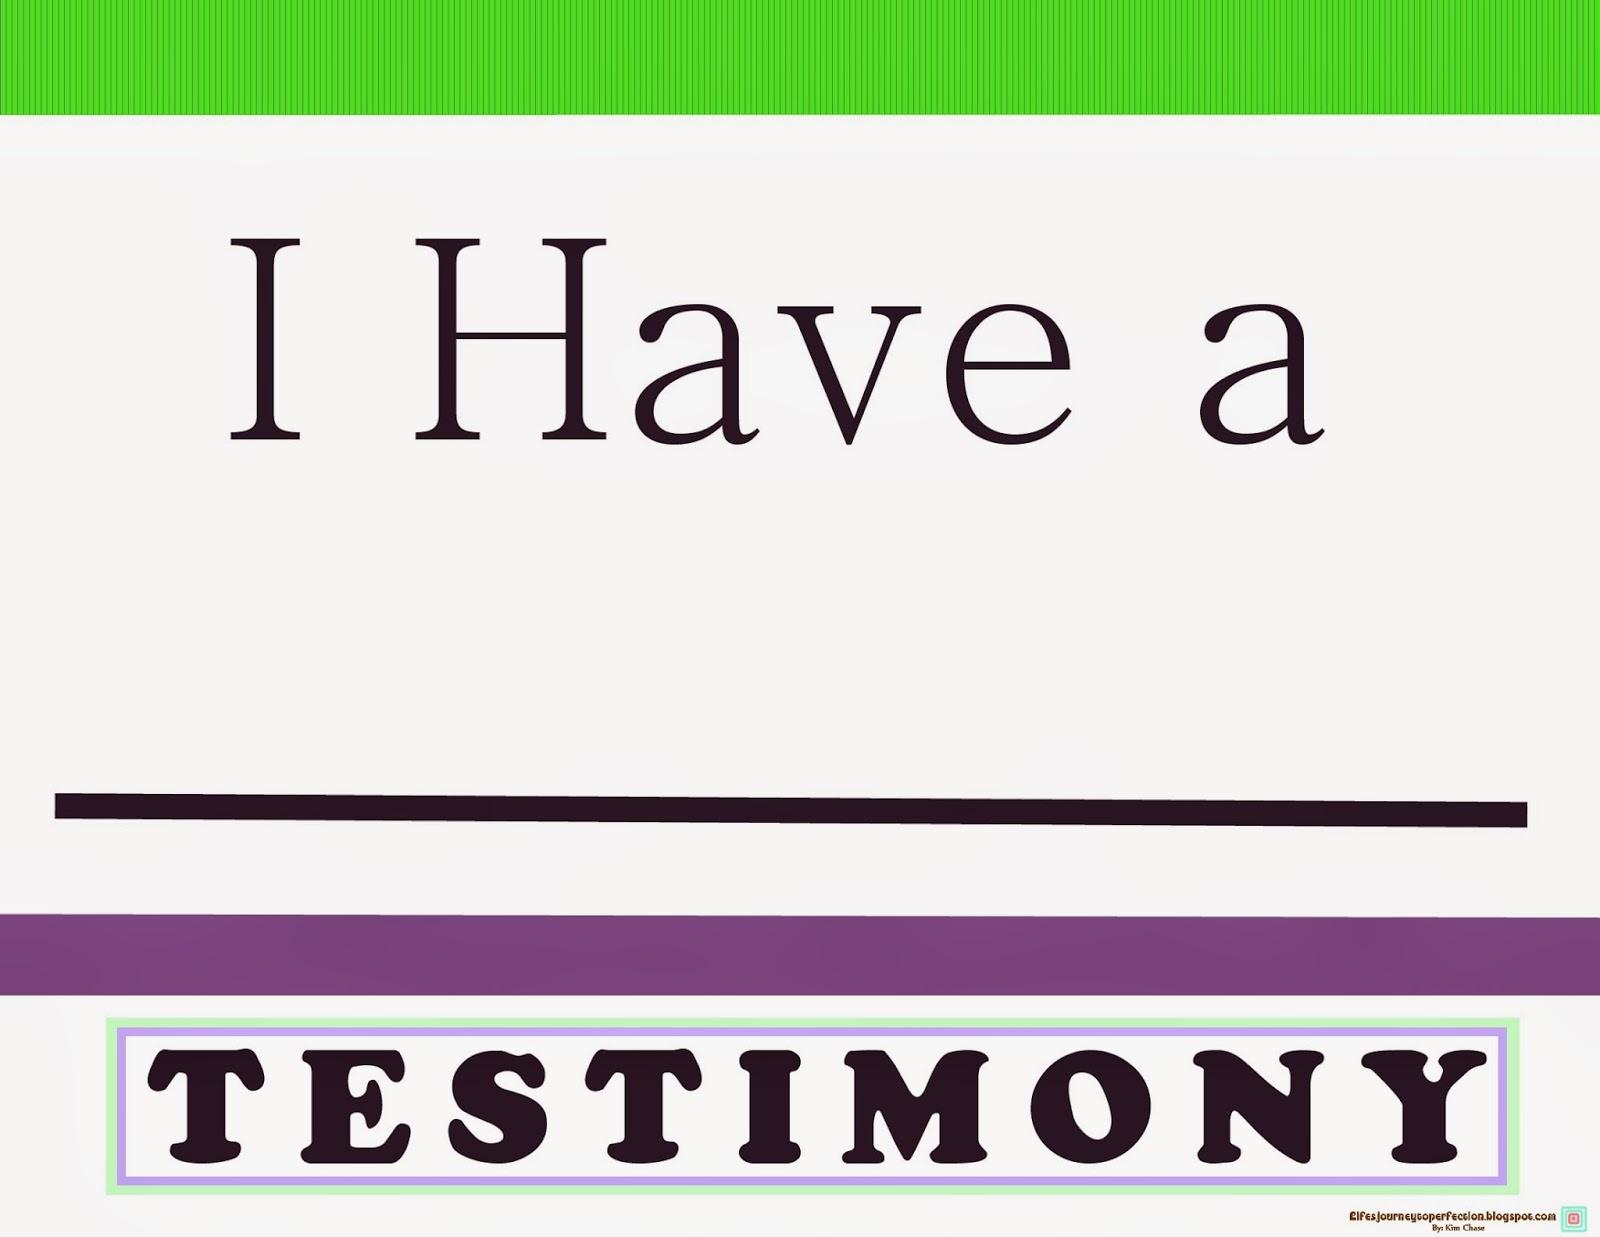 i-have-a-testimony